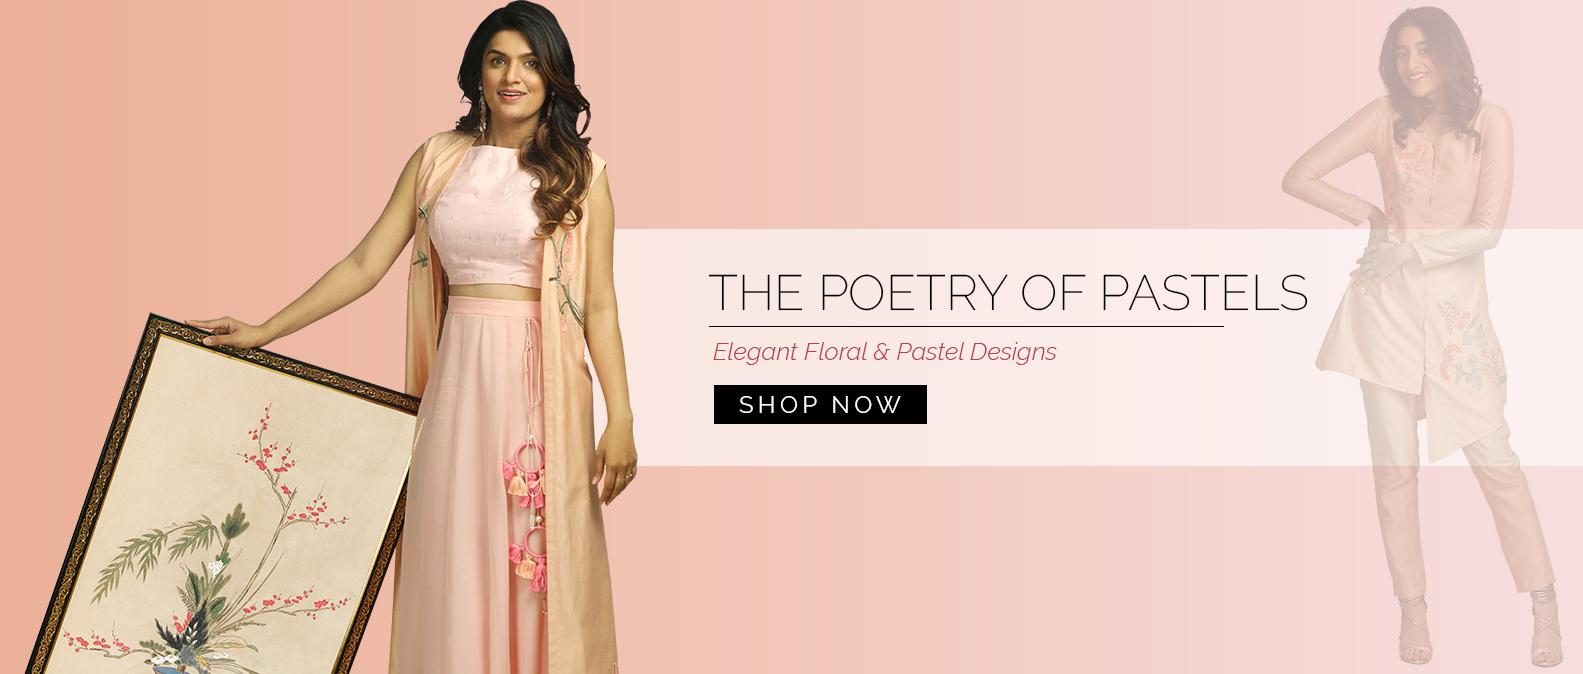 Lakkars Fashion: Western wear for young women